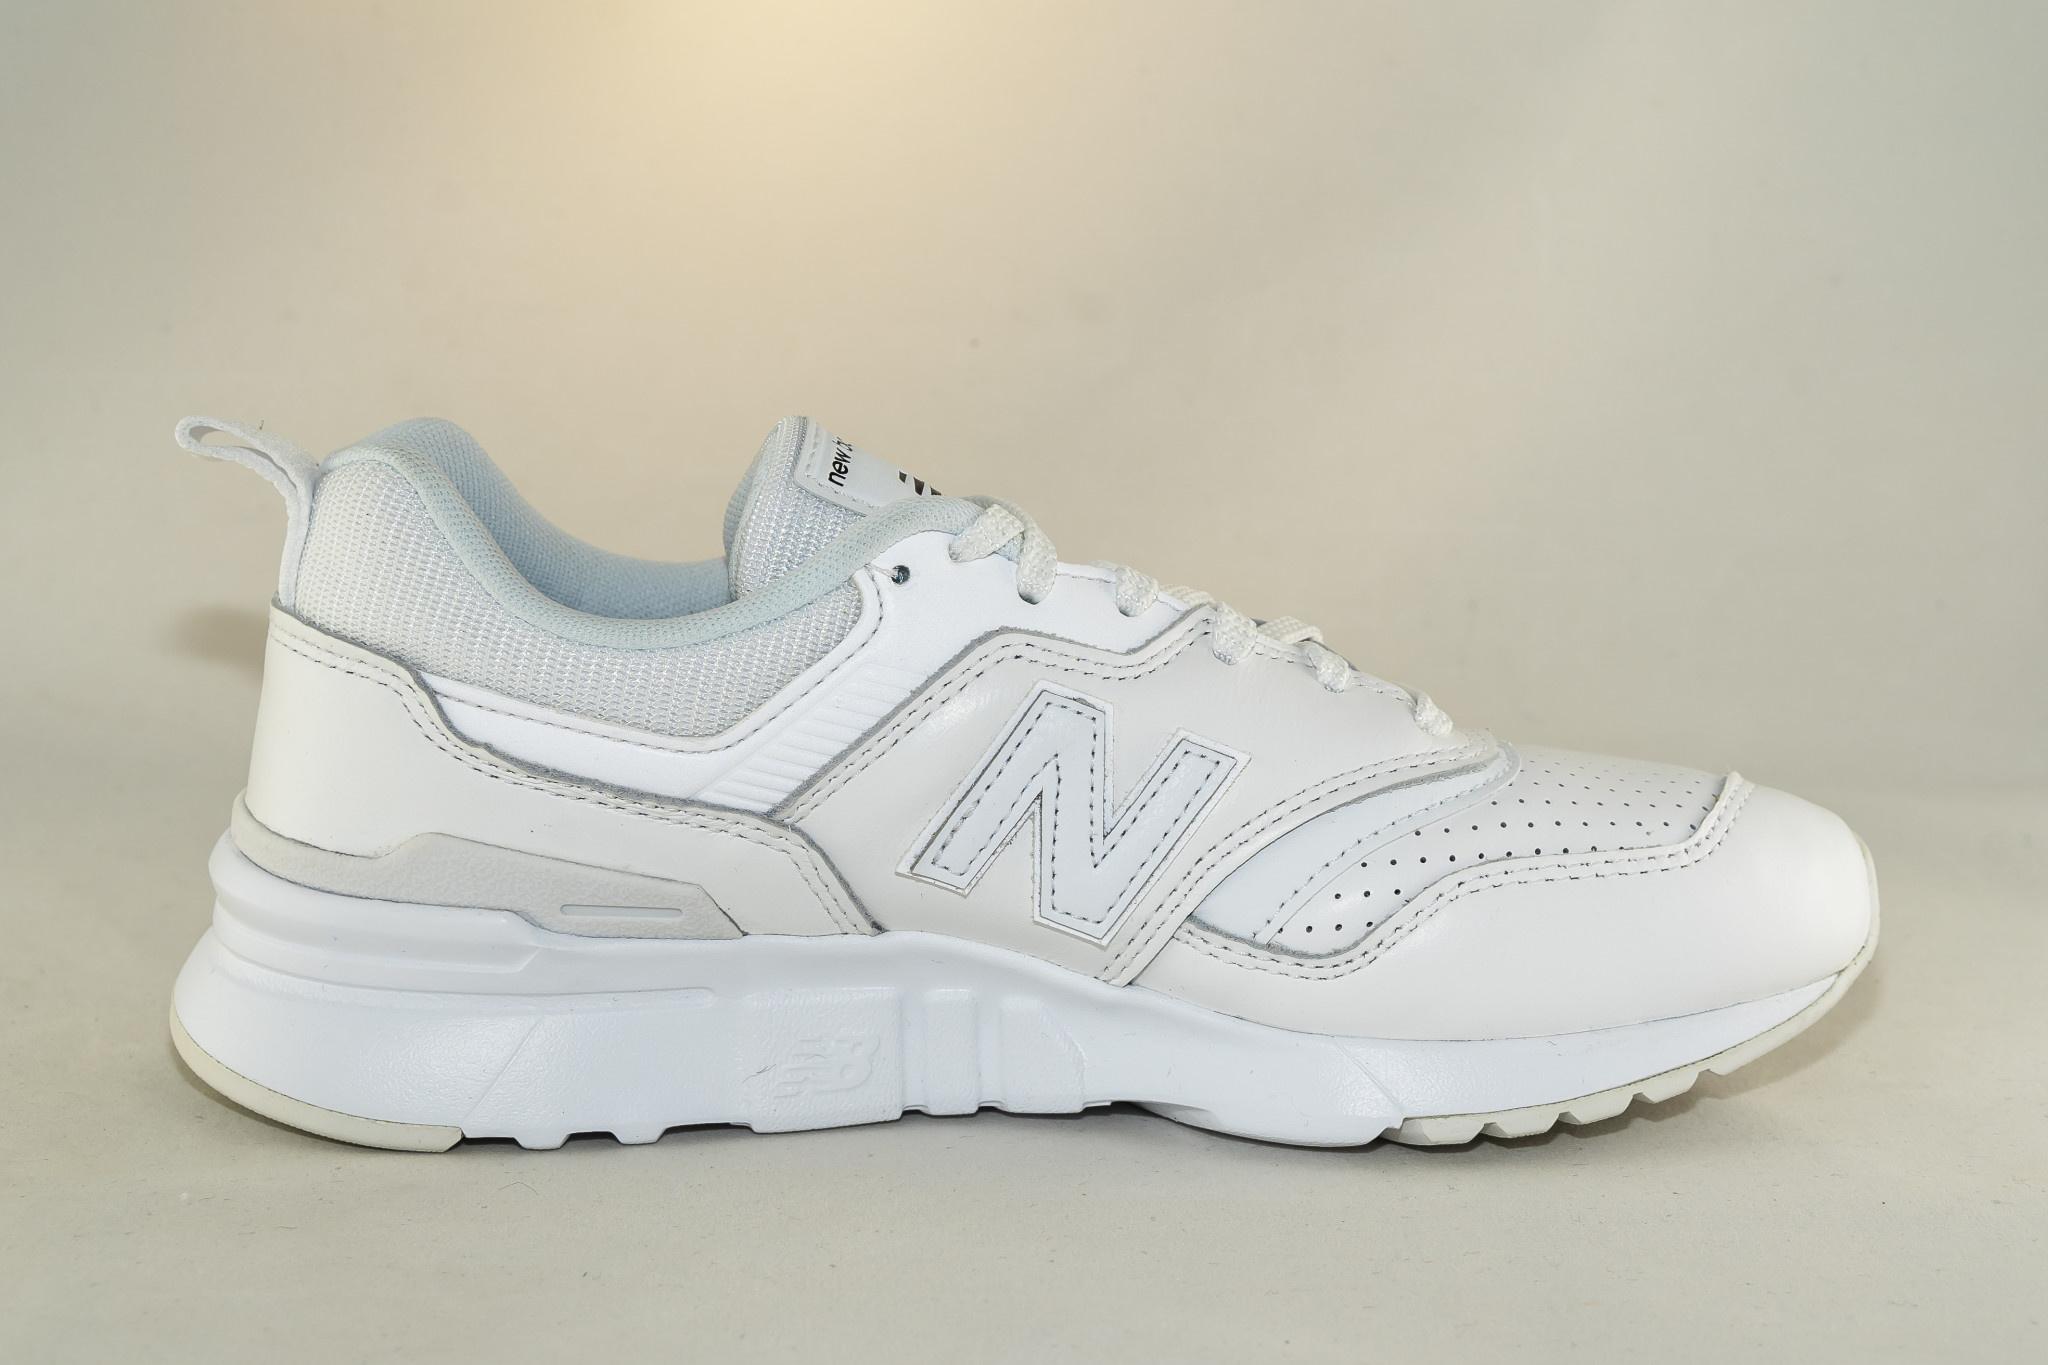 New Balance CM997HDW White